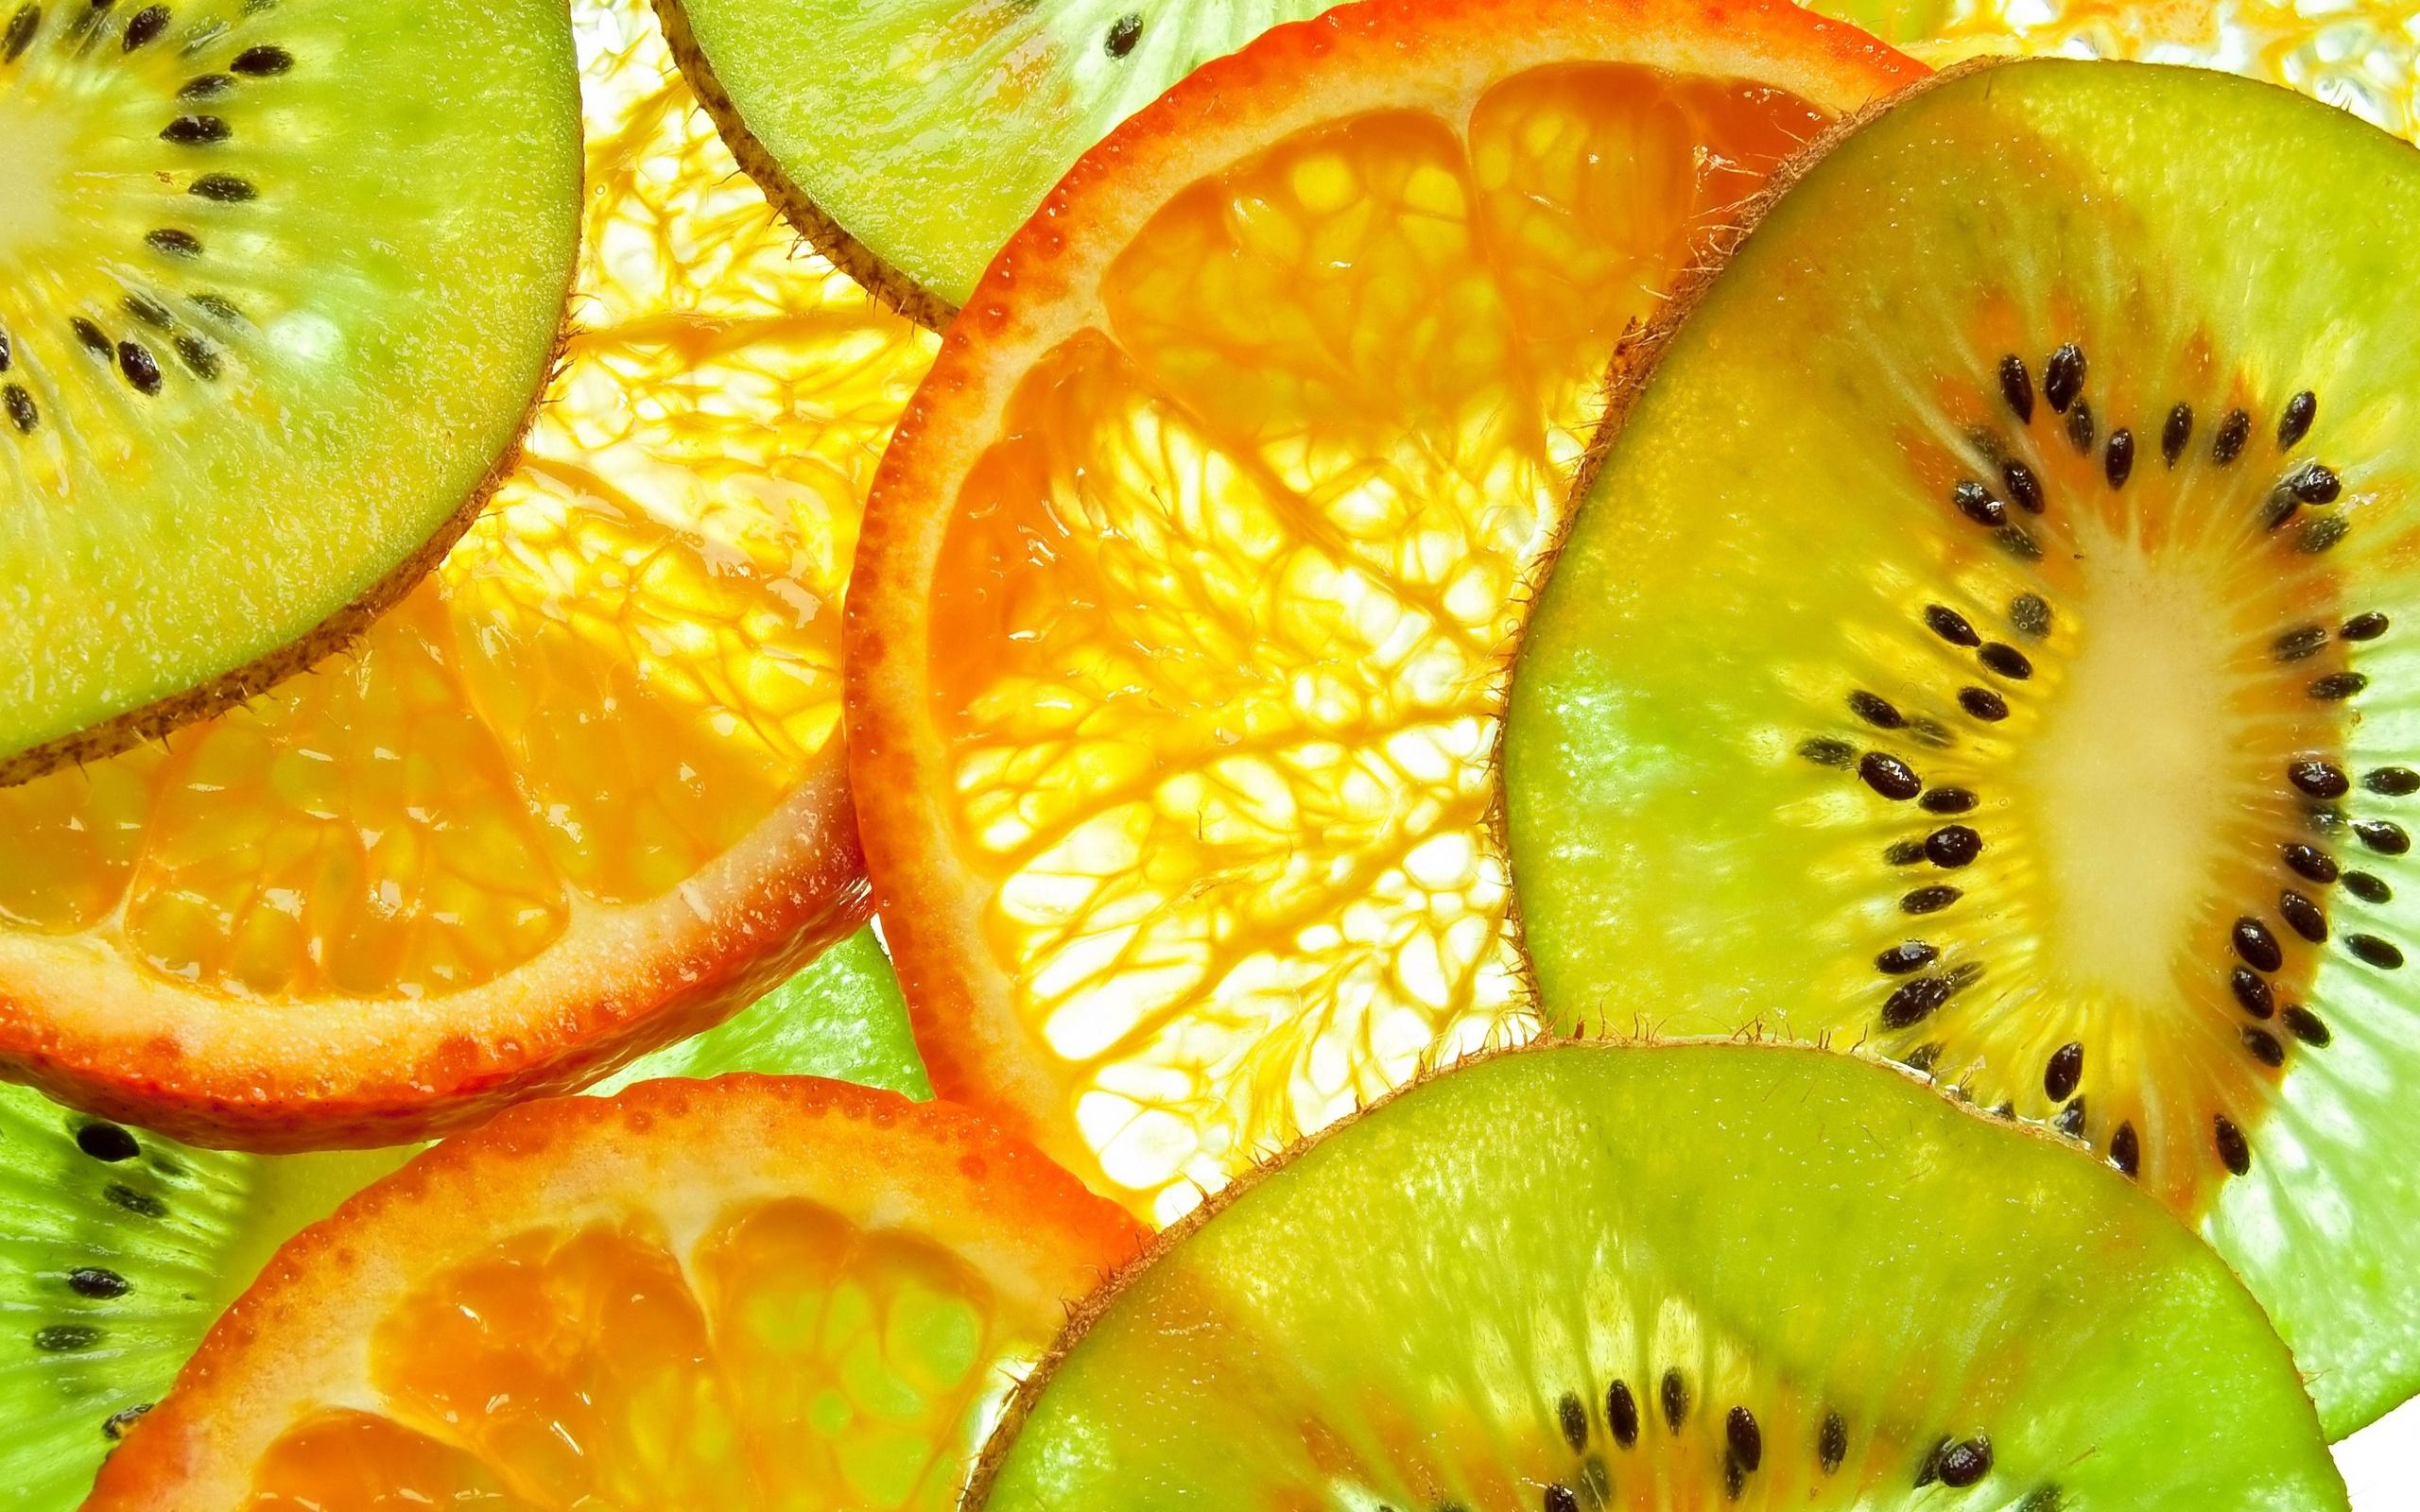 Download Fruit Wallpapers 2560x1600